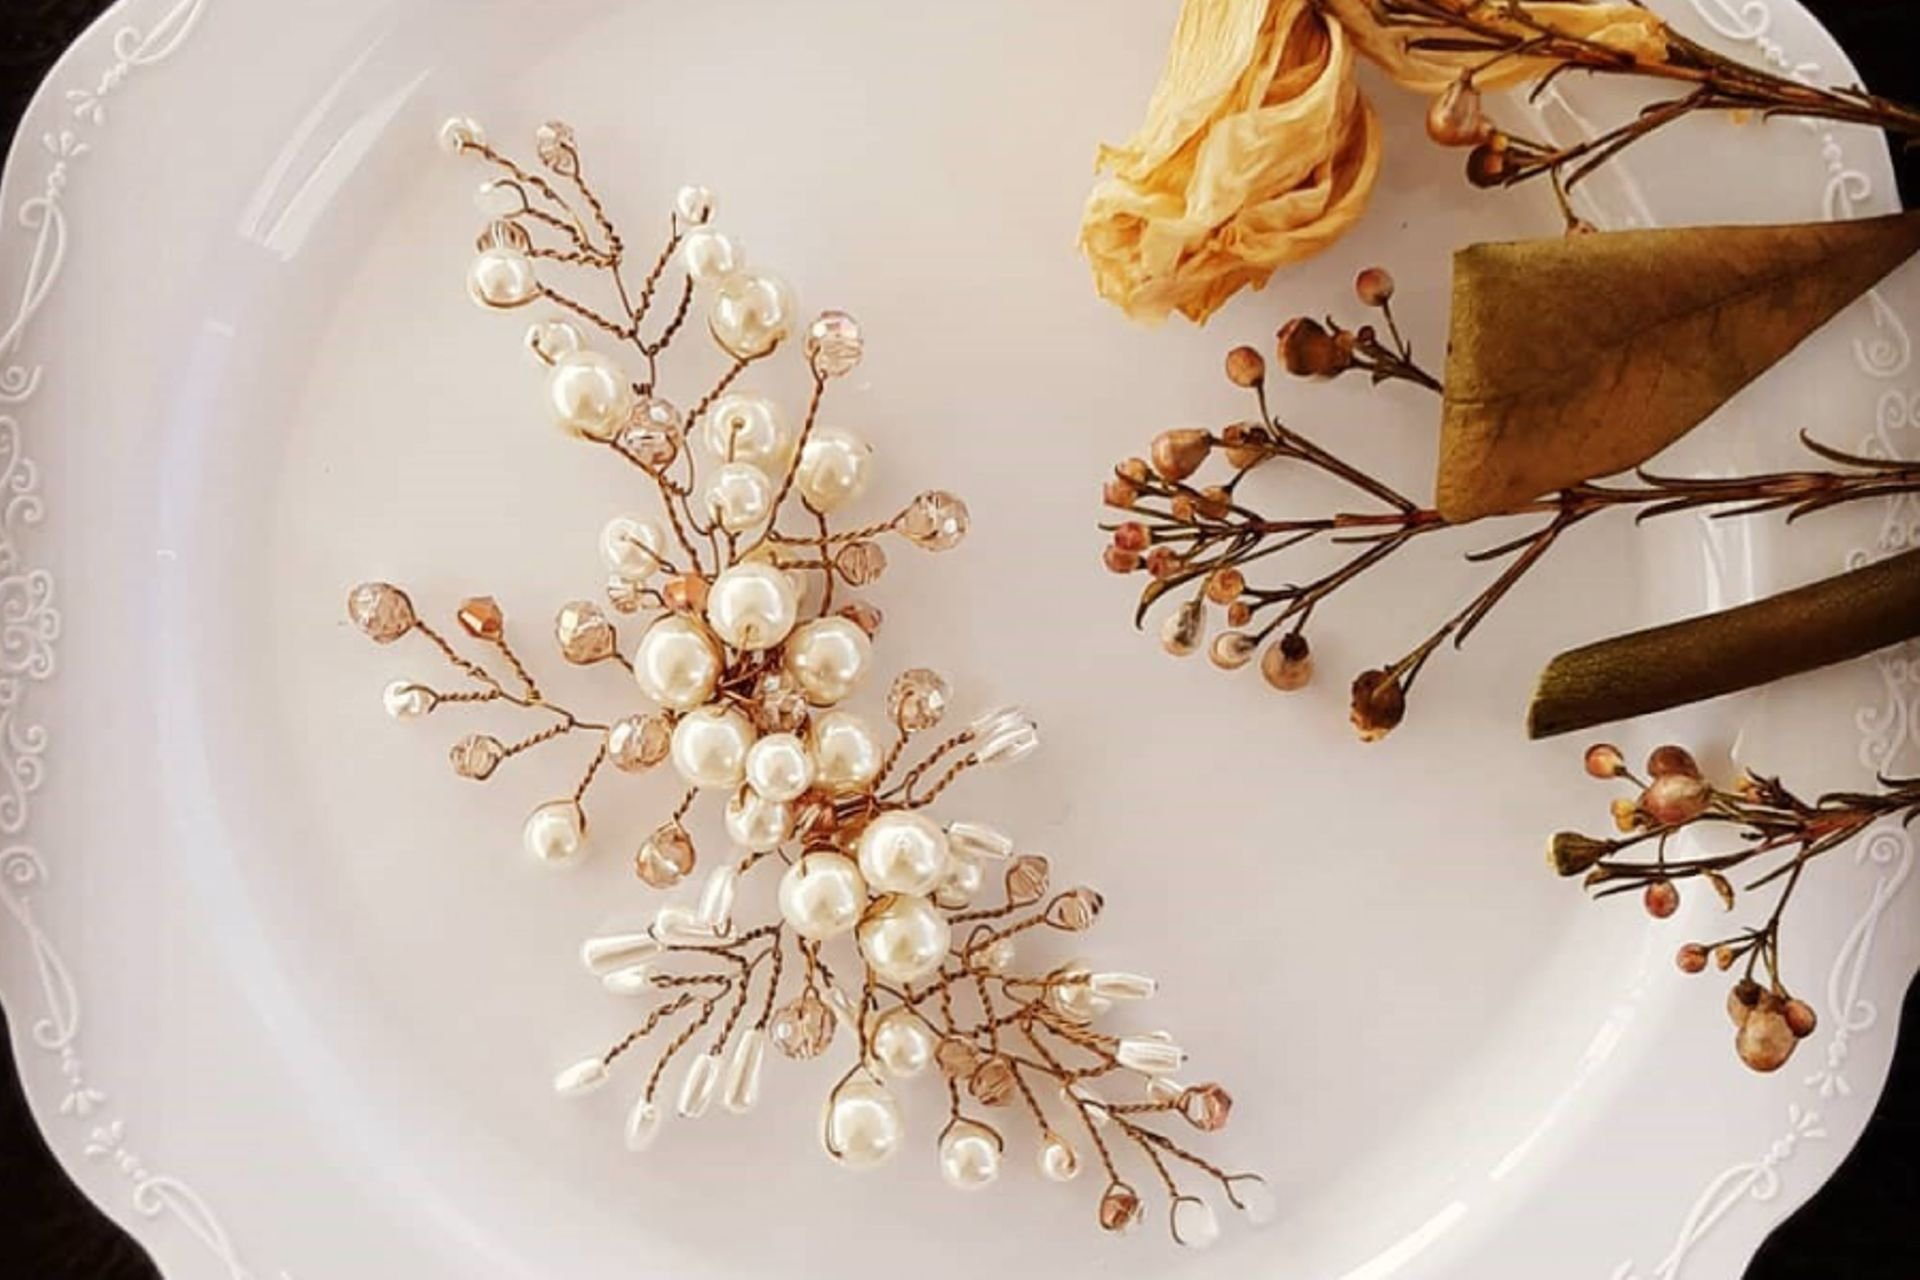 36 lantana beads jewelry designer תְמוּנָה